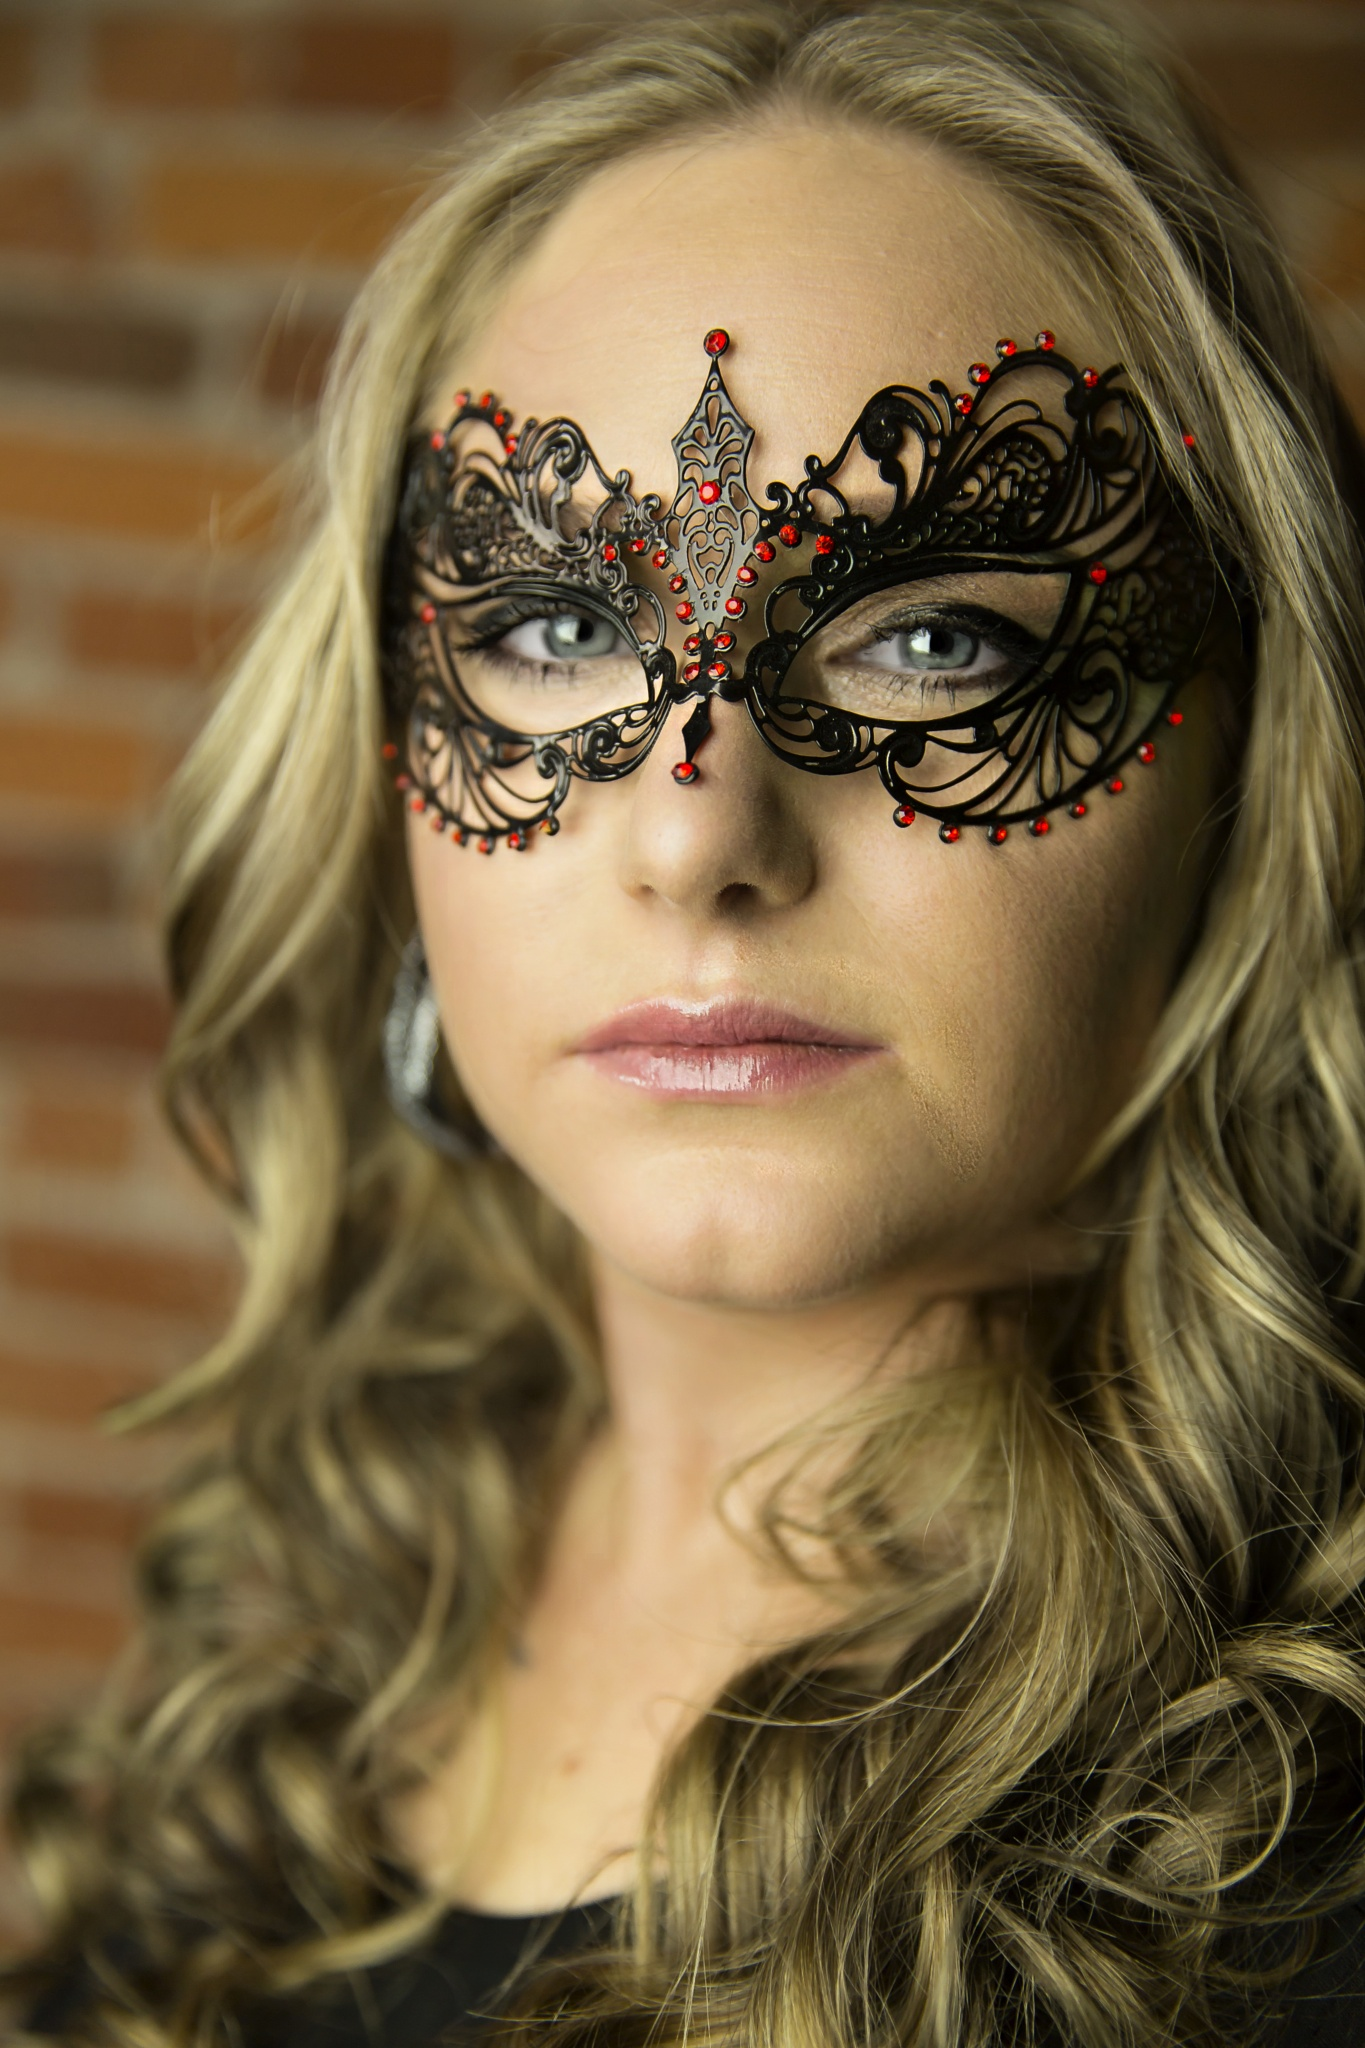 Tina Masked by Studio Tracy